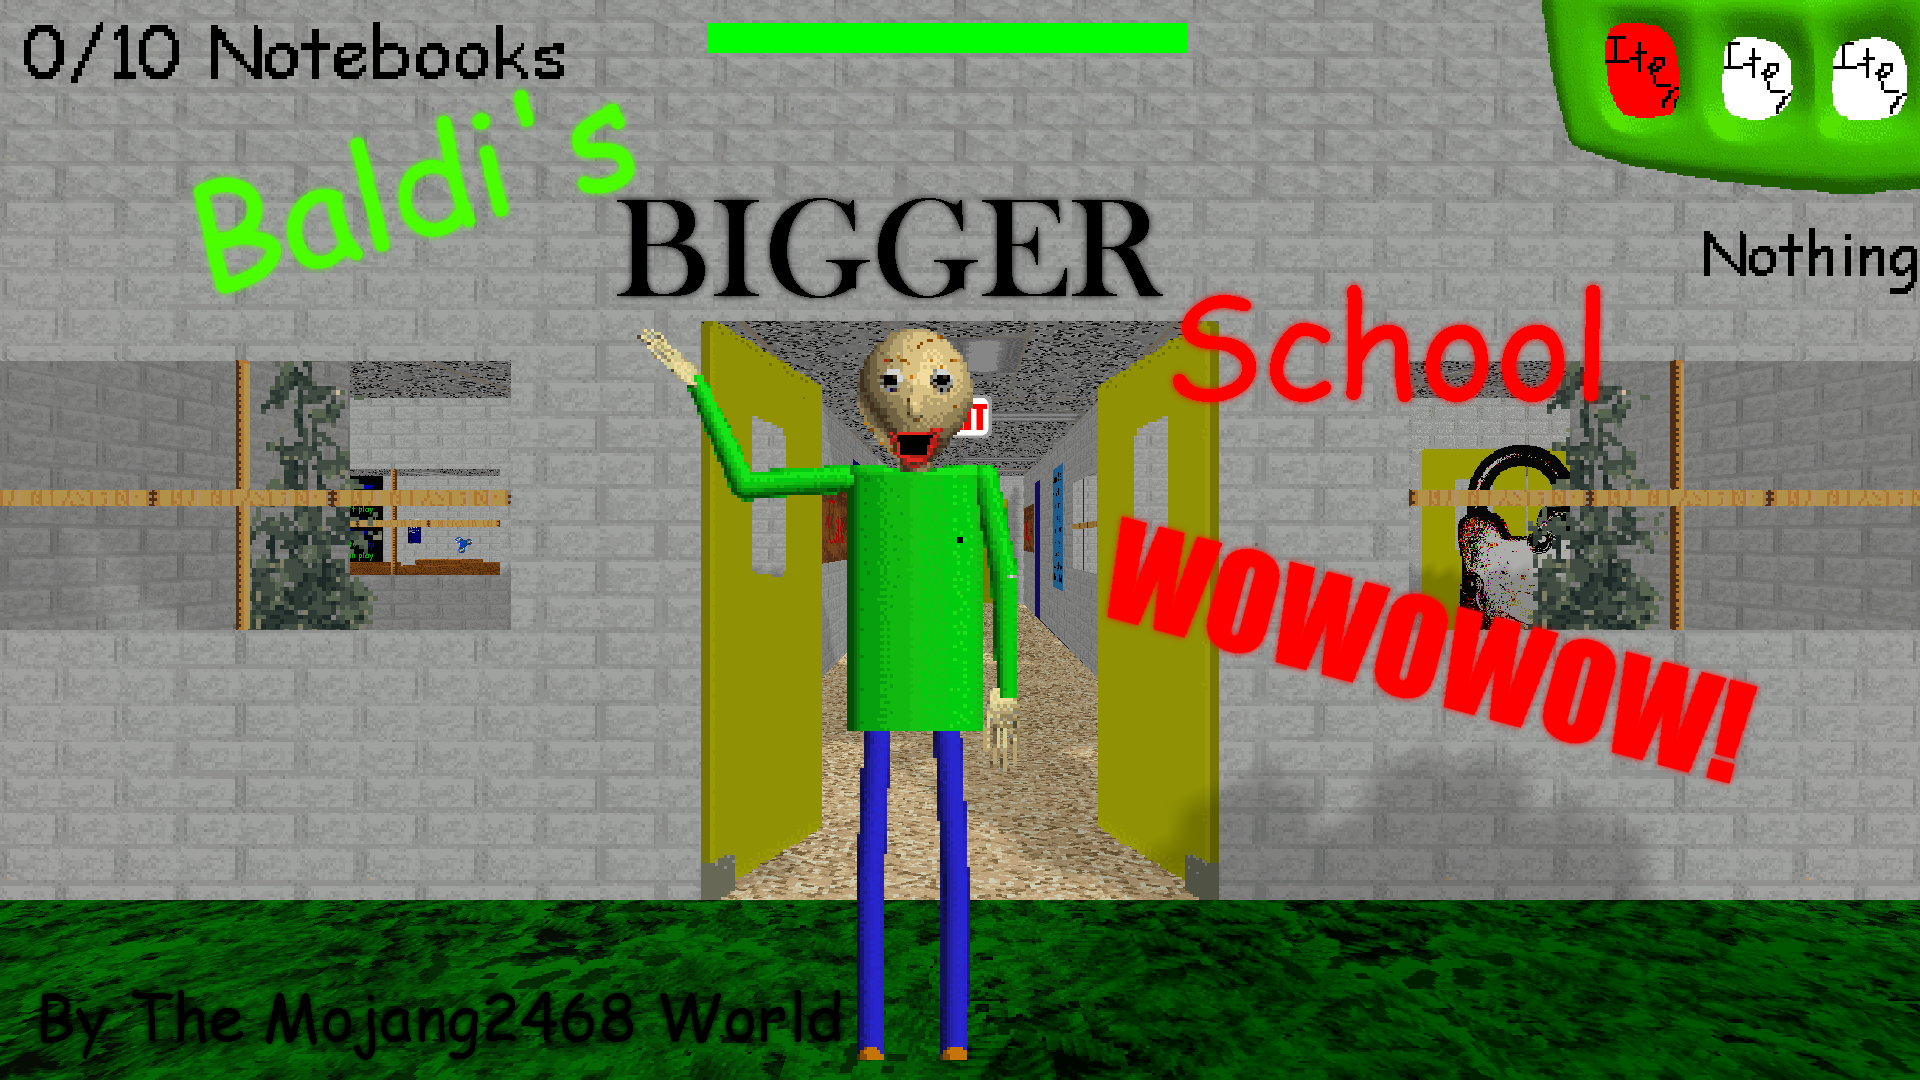 Baldi's Bigger School